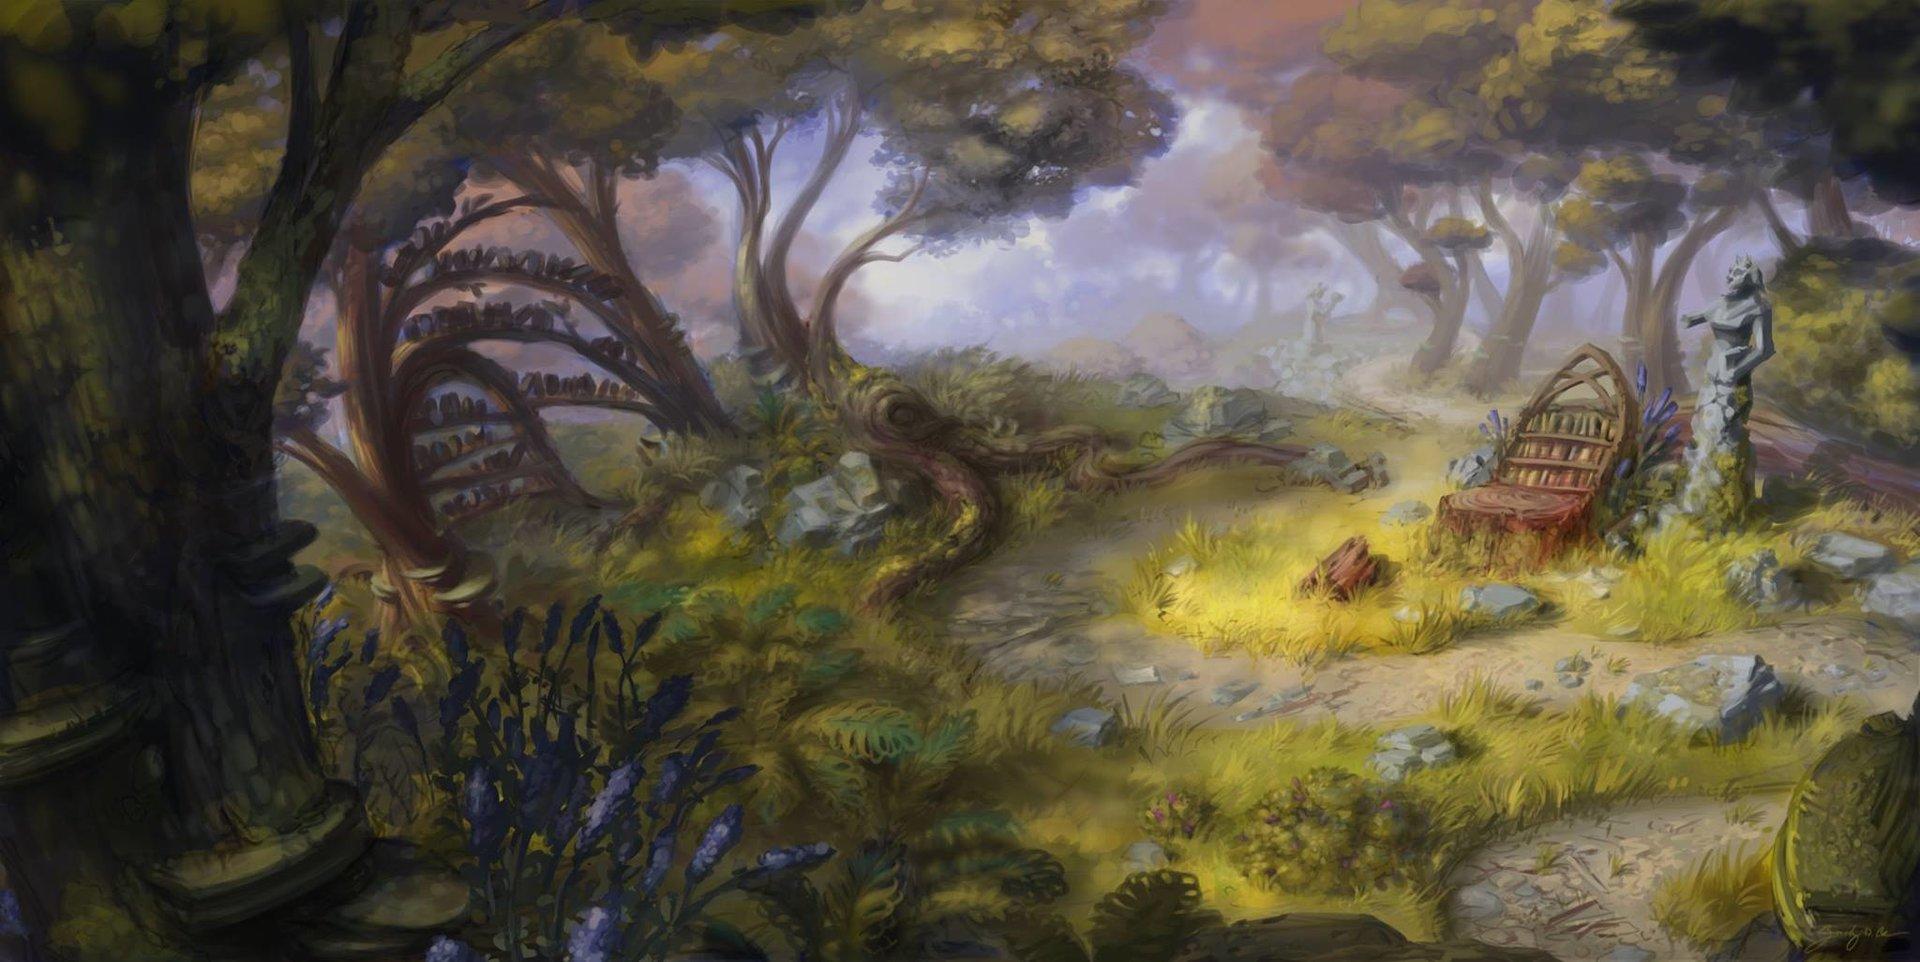 Deep Woods Key Art by Zachary D. Coe